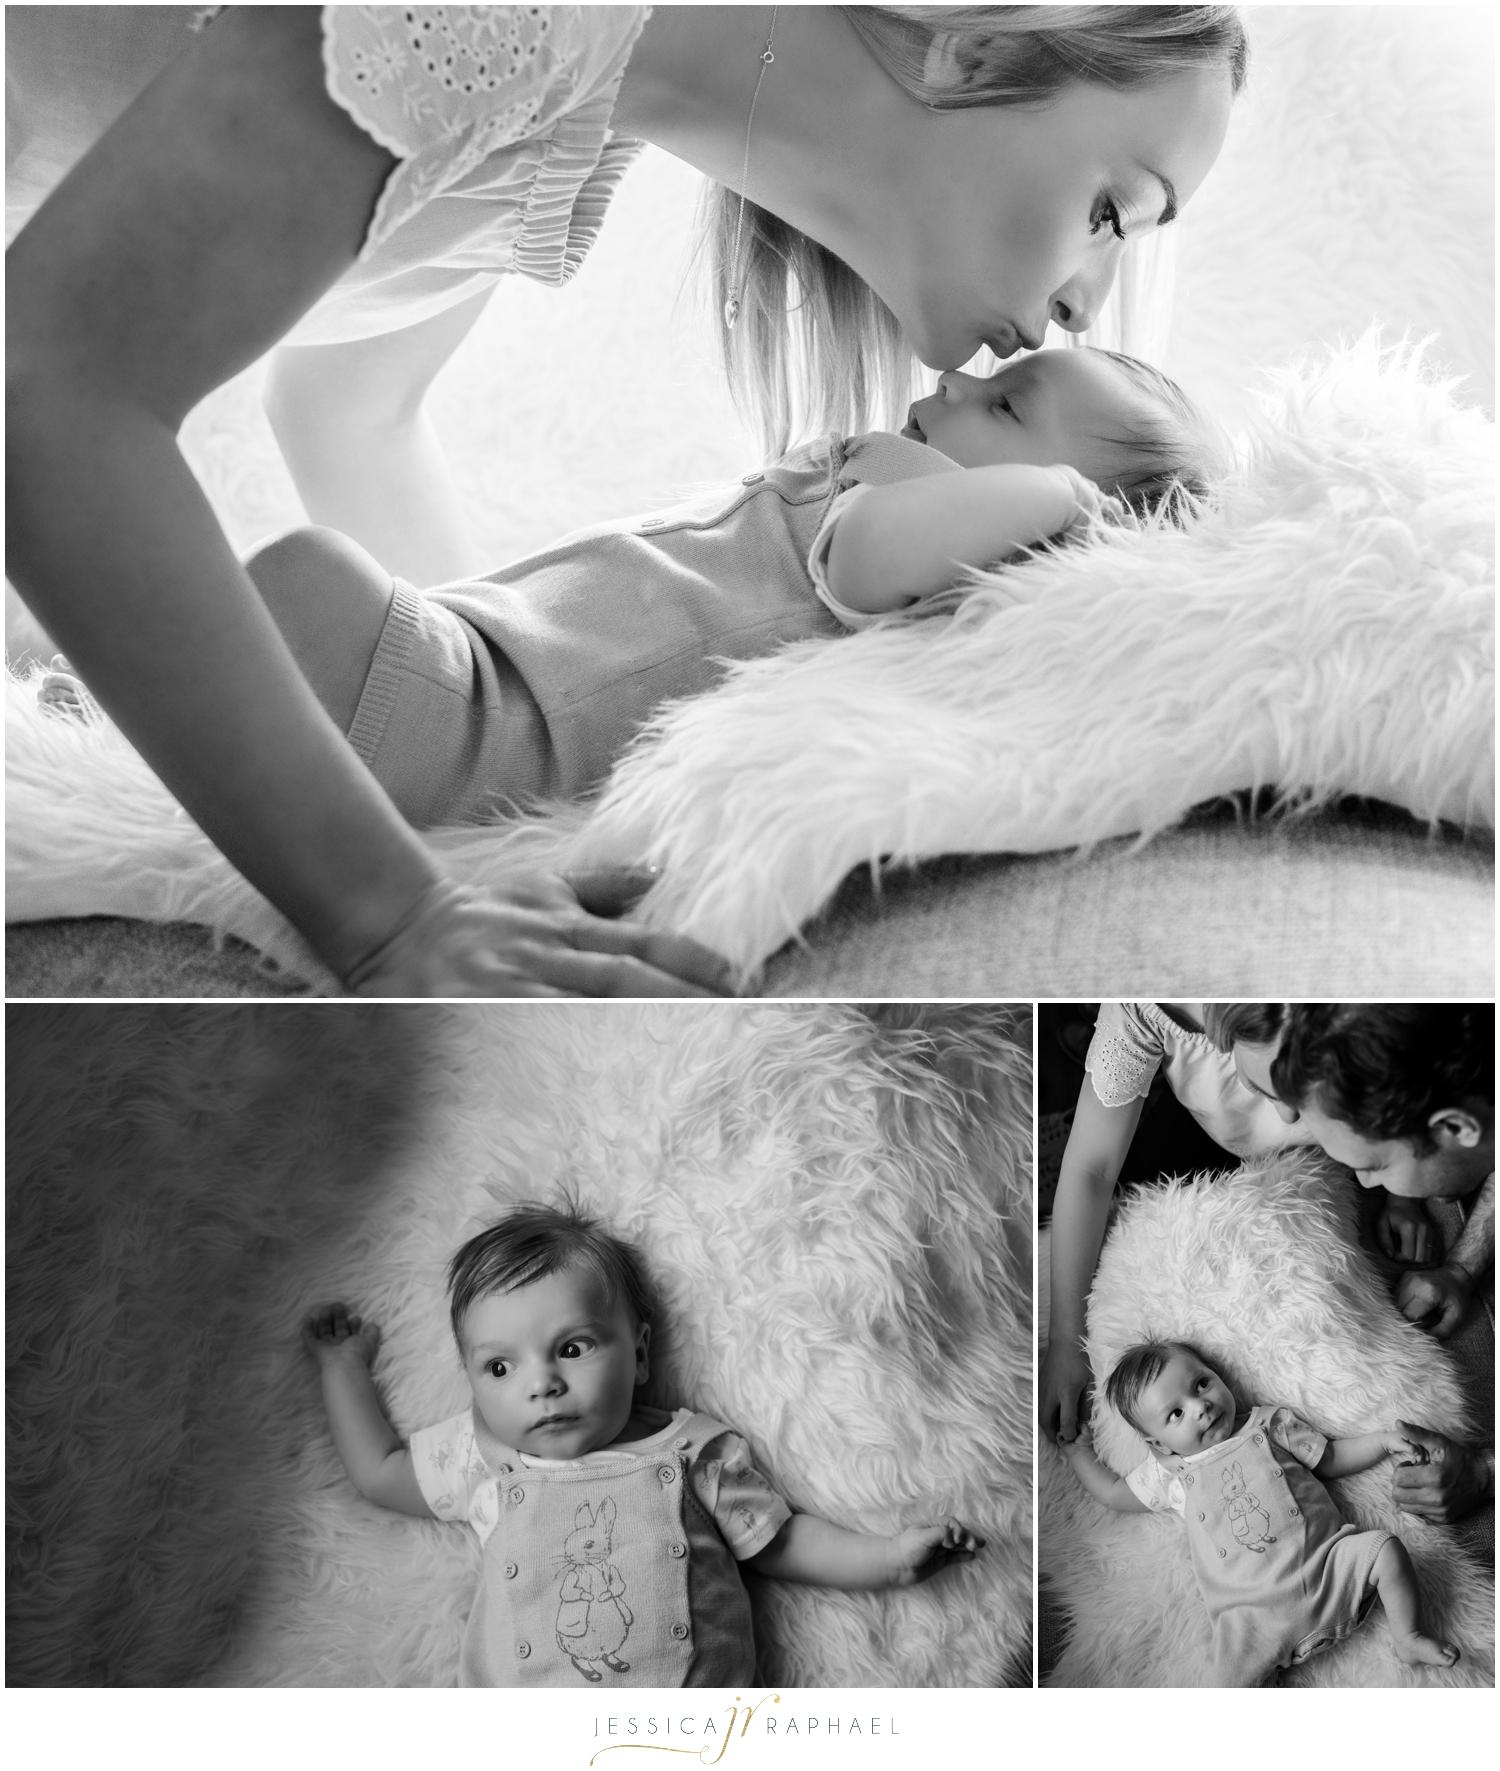 newborn-photography-newborn-photographer-family-photography-birmingham-family-photographer-jessica-raphael-photography